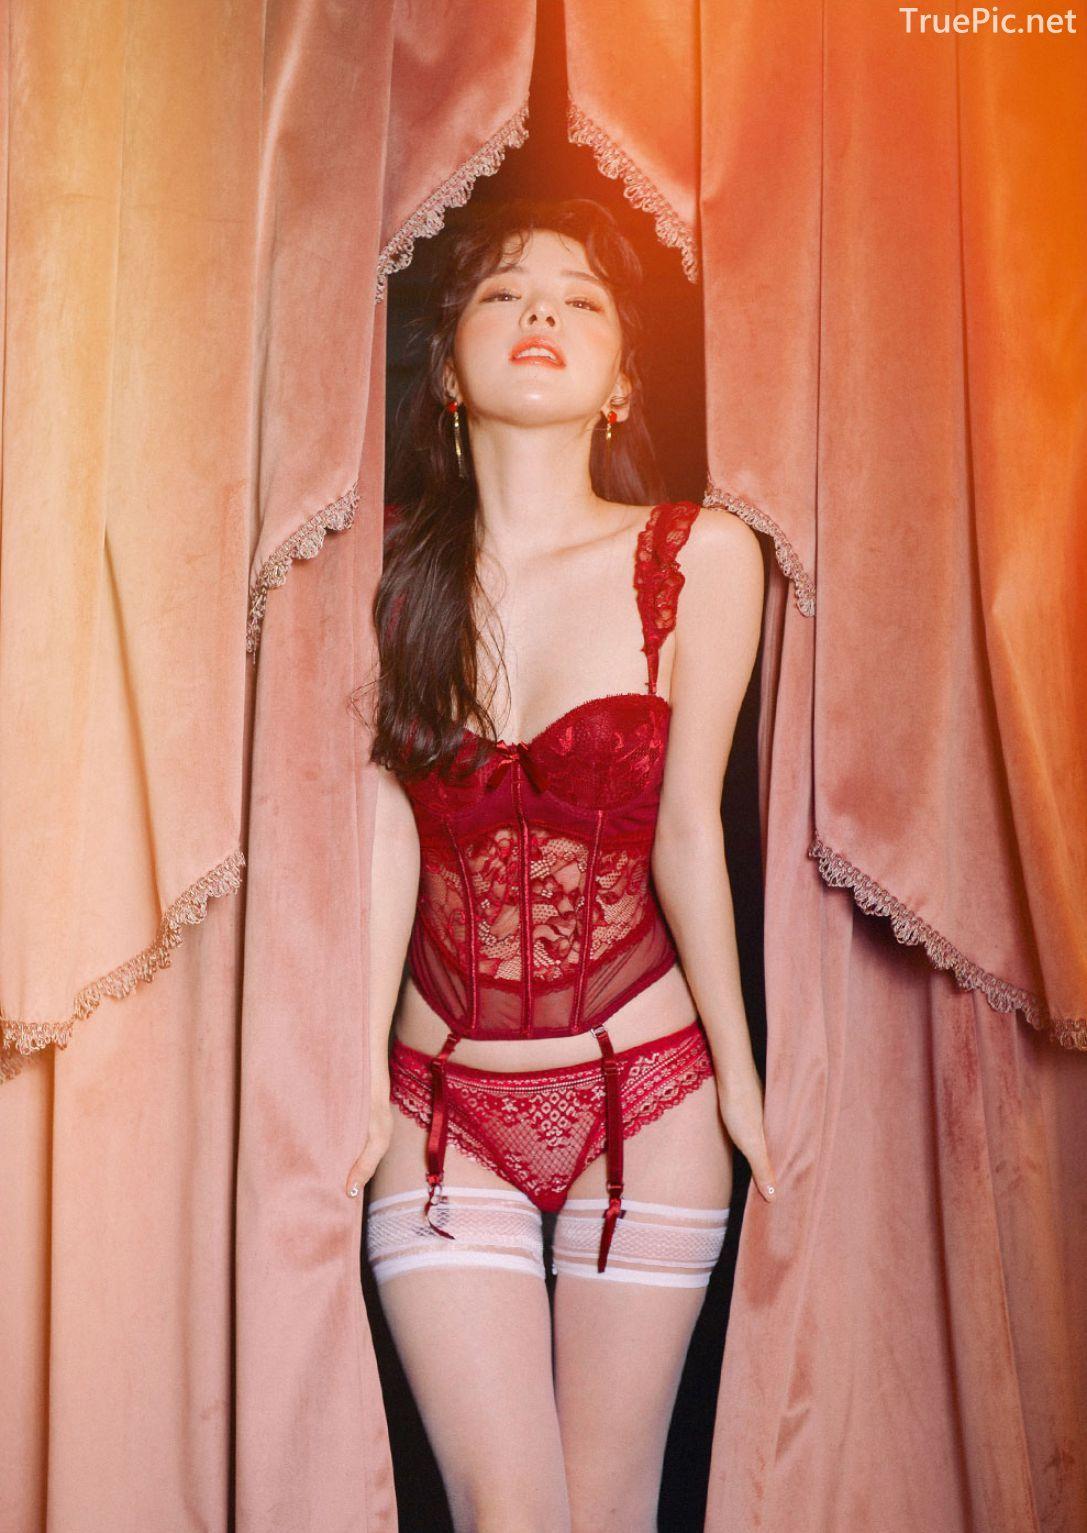 Korean lingerie queen Haneul - Valentine Sexy Lingerie Set - TruePic.net - Picture 8